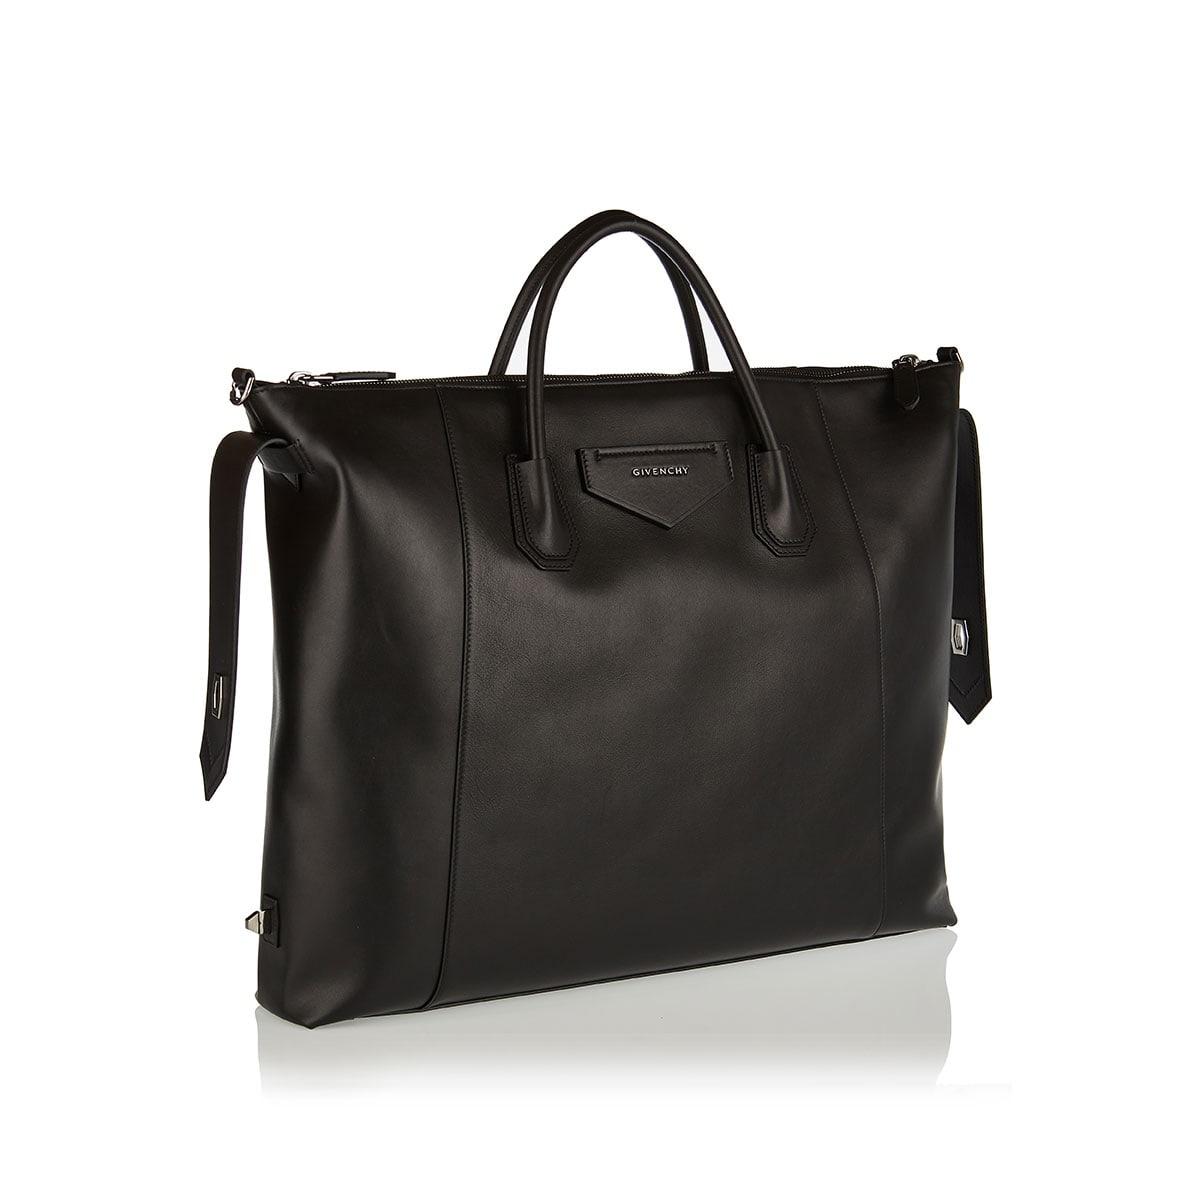 Antigona Soft large leather tote